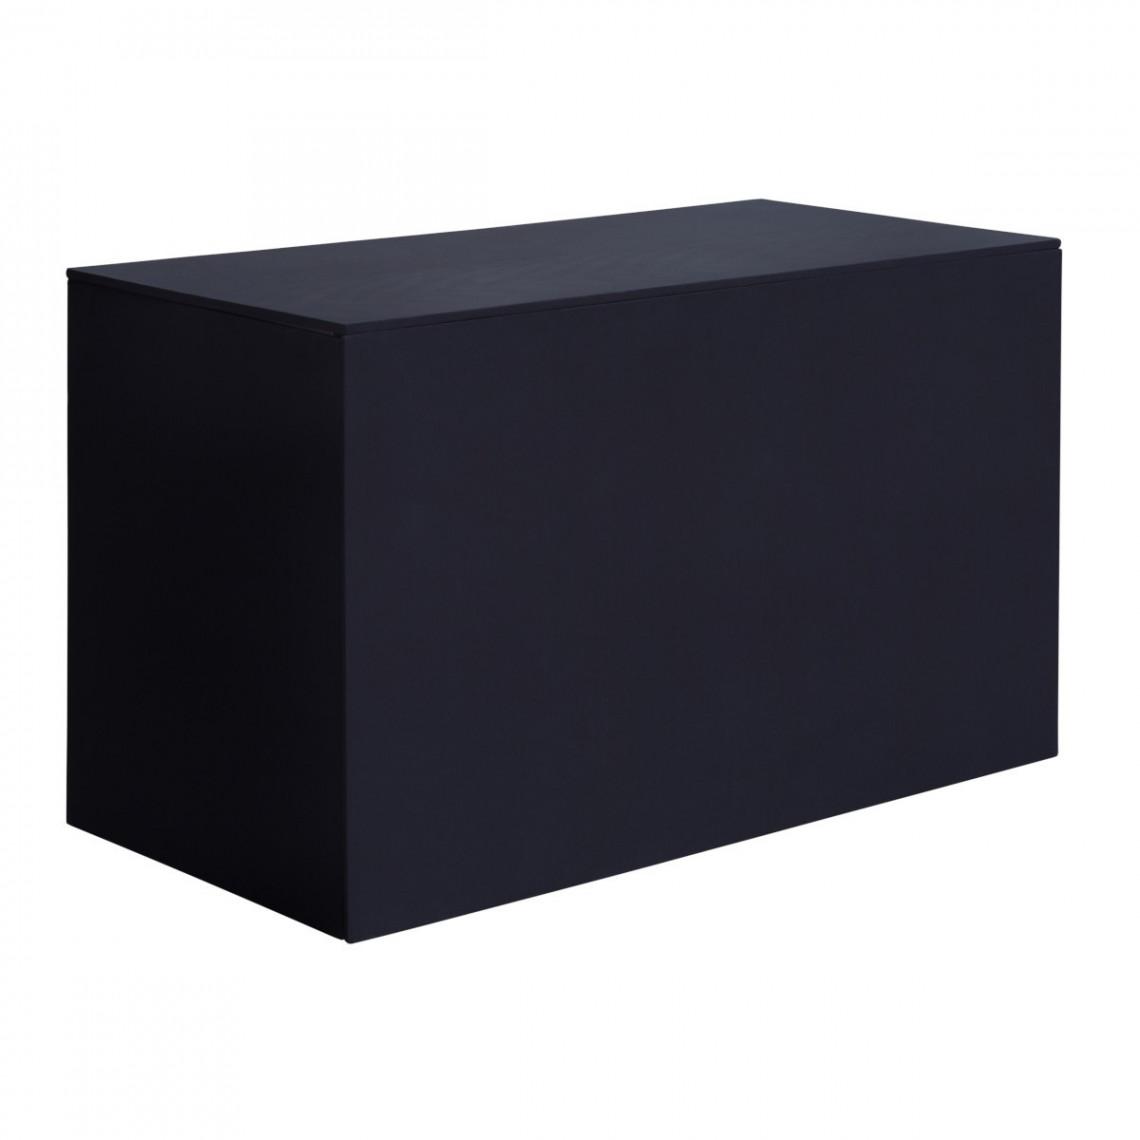 Buffet Universalis coton gratté noir